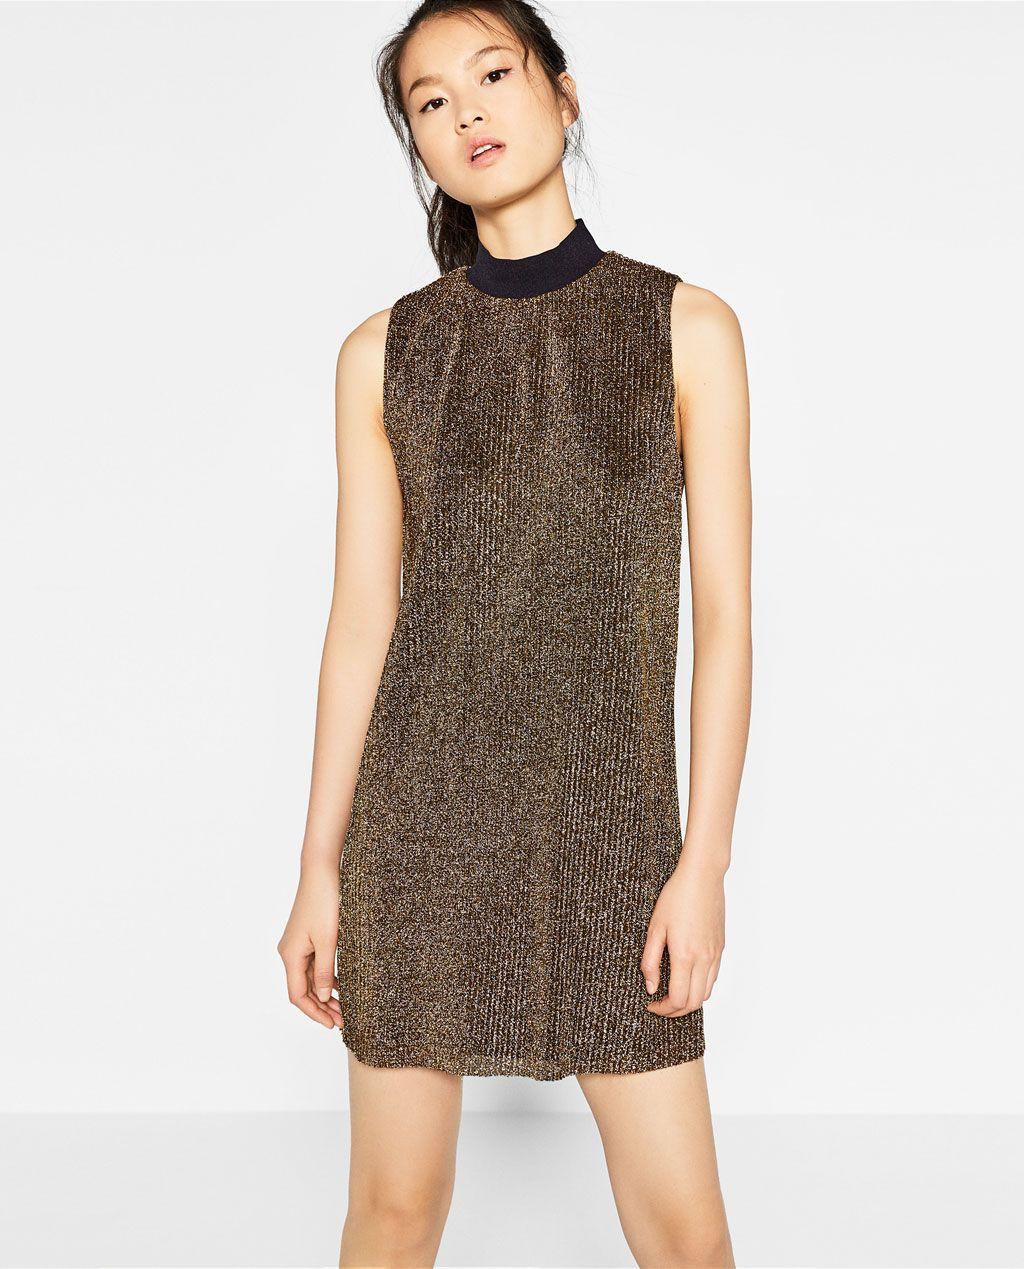 zara - woman - shiny pleated dress | ball dresses, dresses